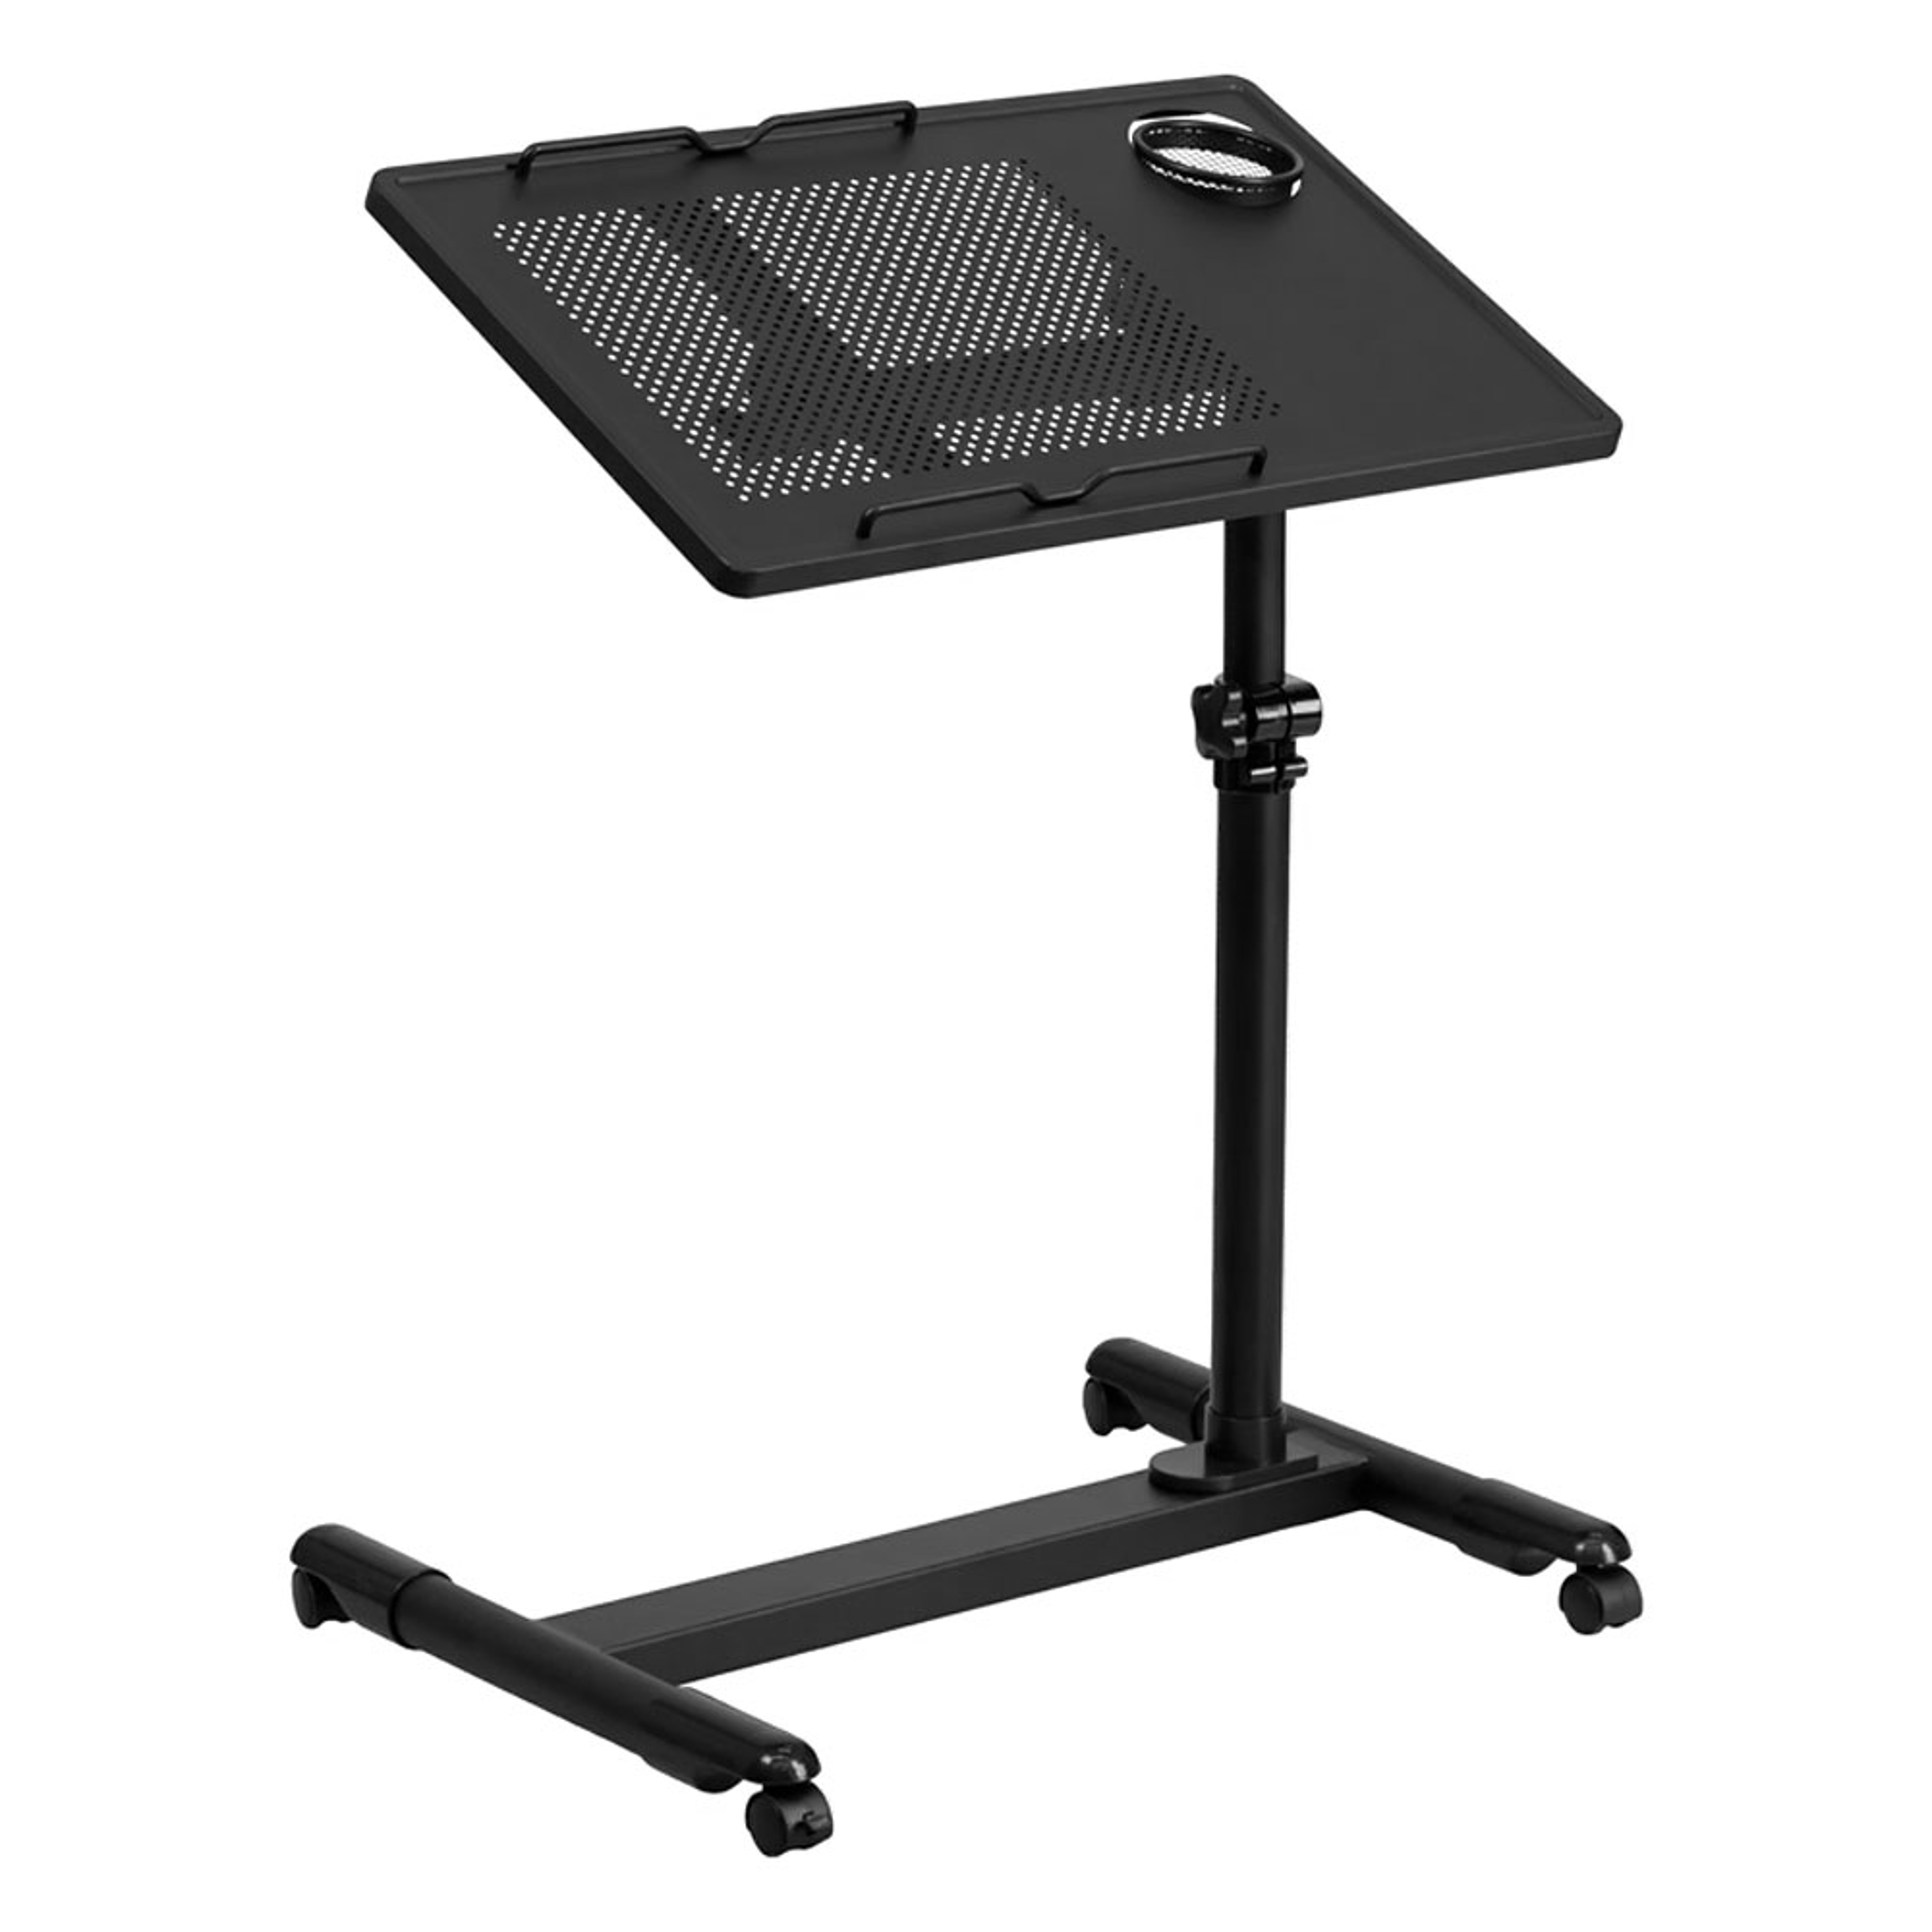 Offex Black Adjustable Height Steel Mobile Computer Desk